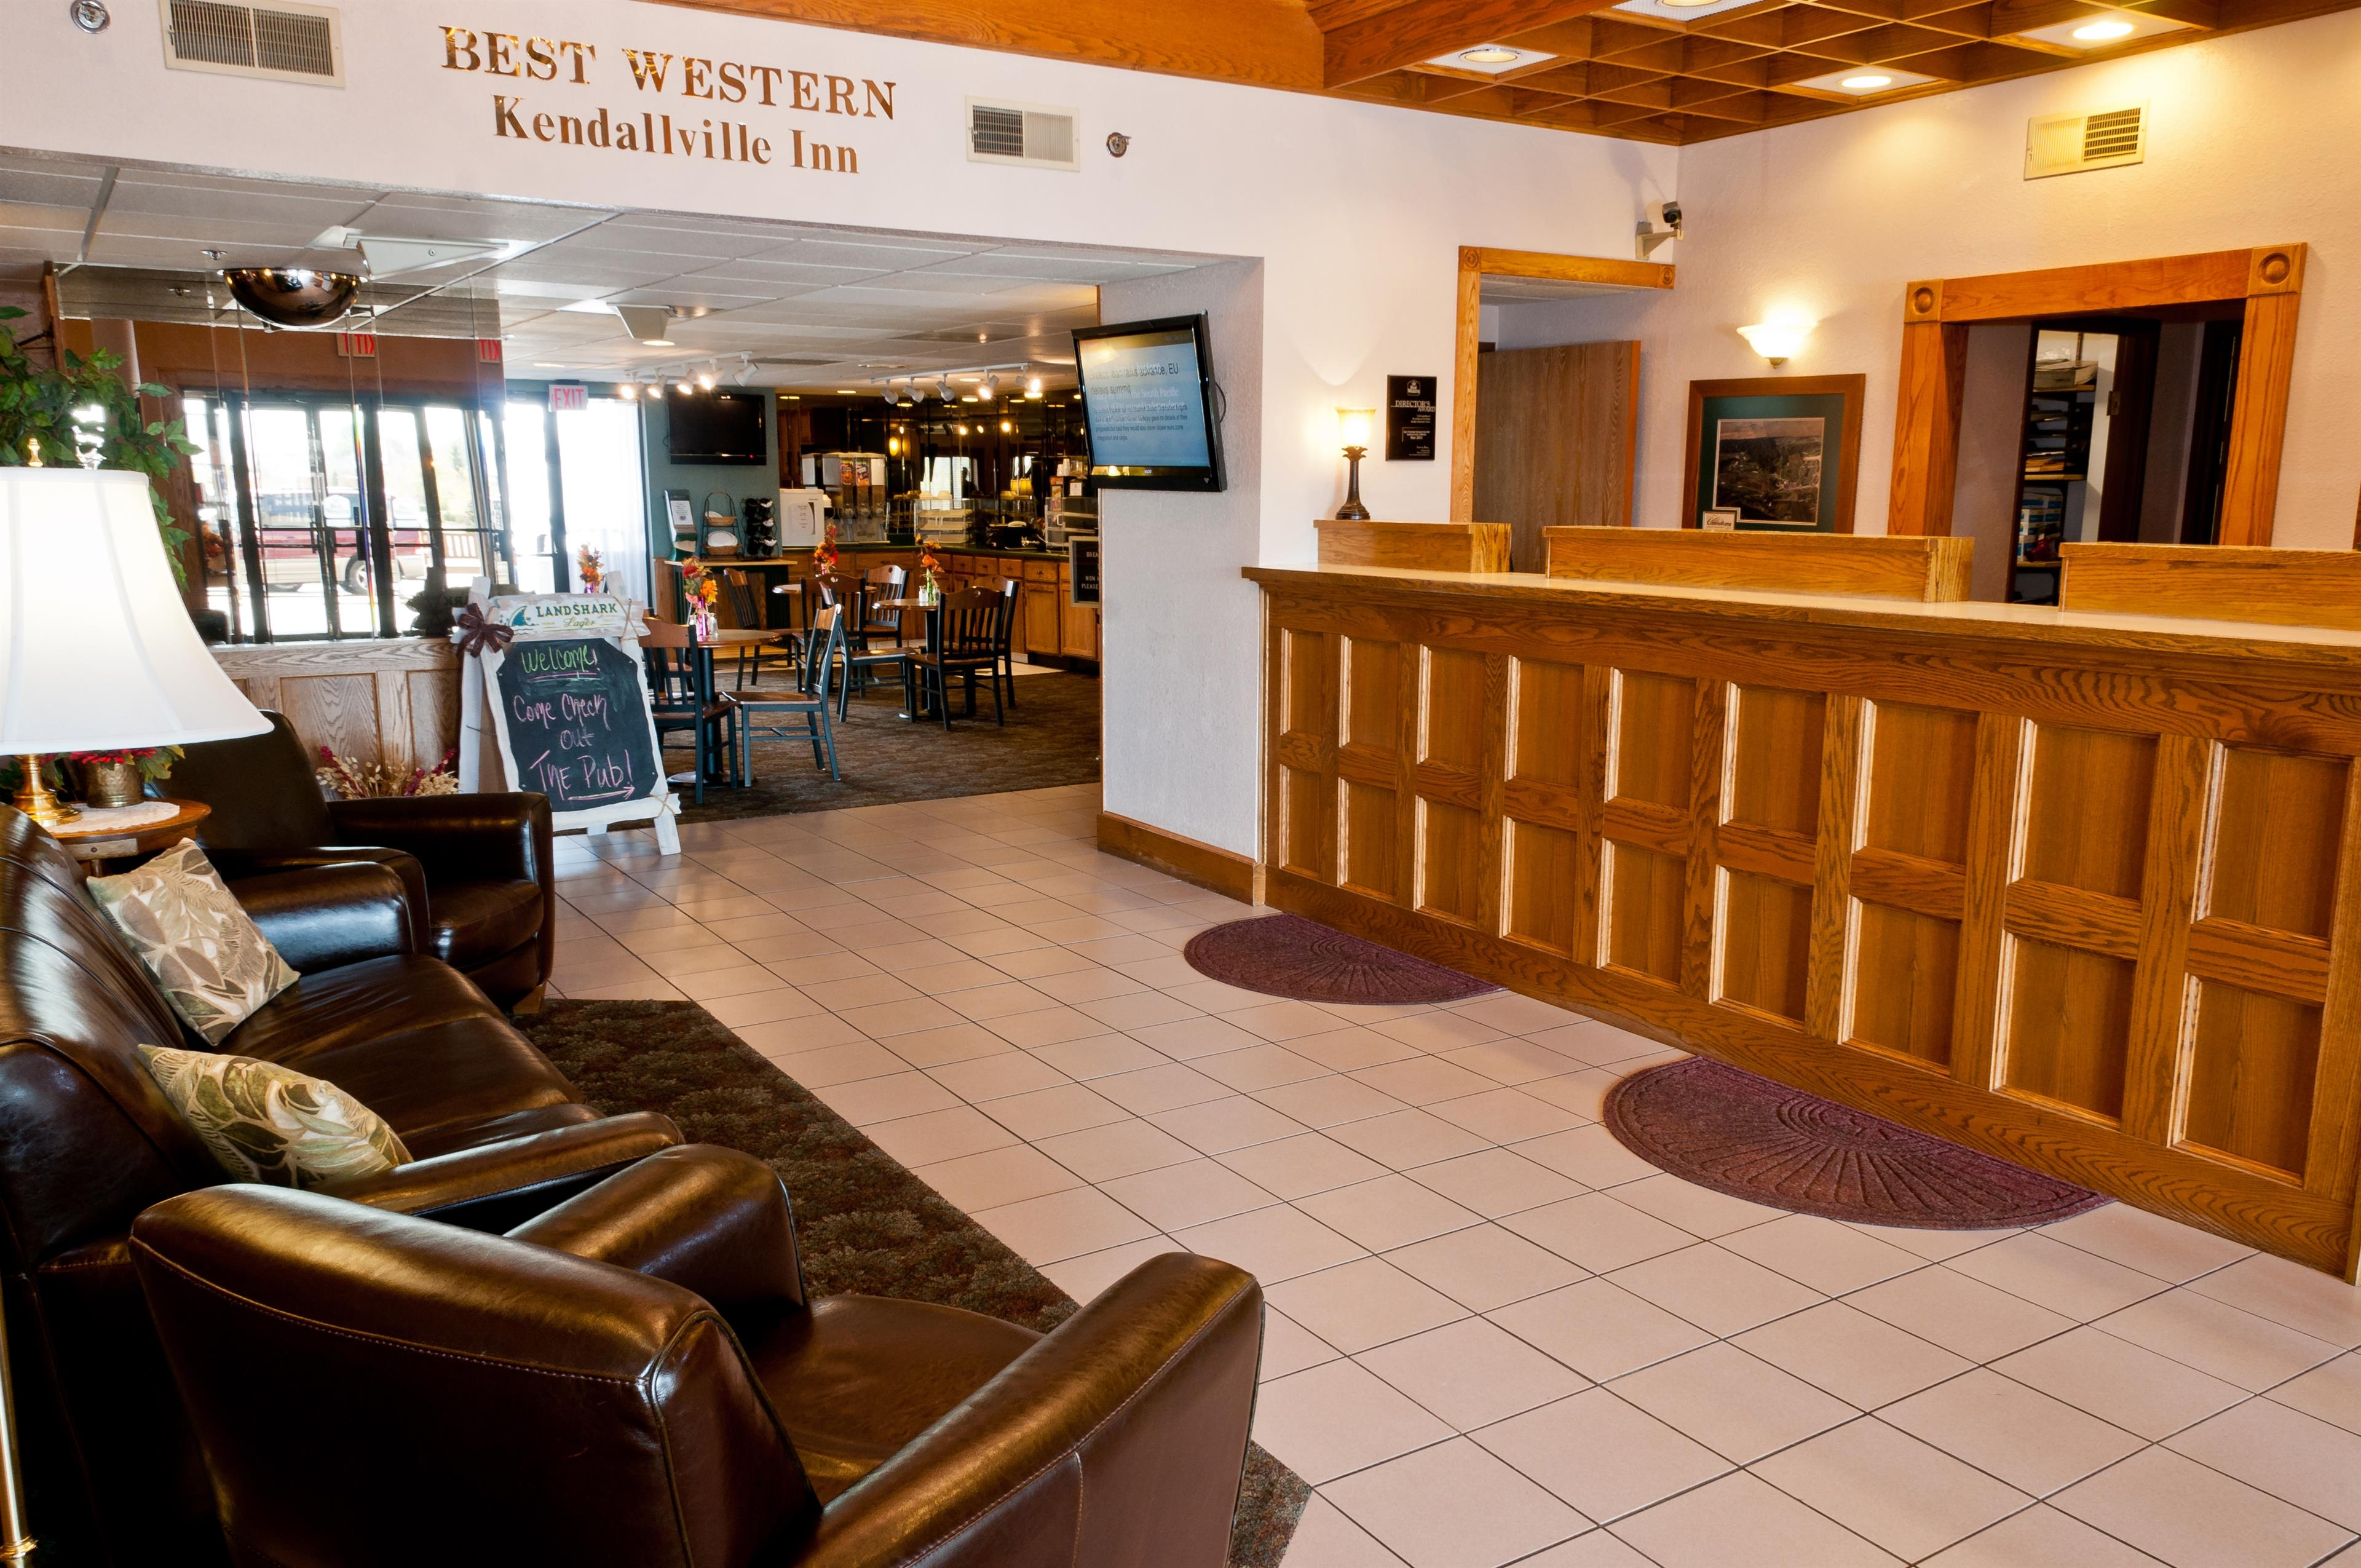 Best Western Kendallville Inn image 17